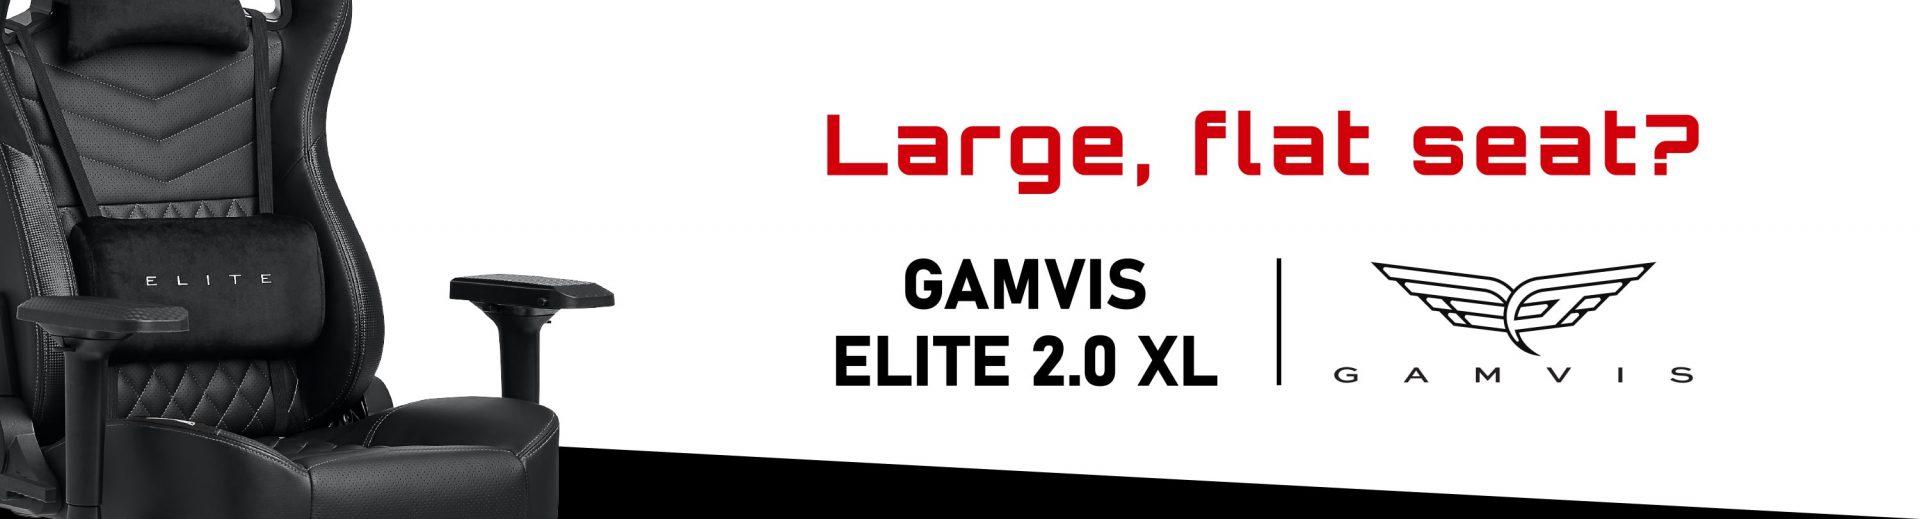 LARGE FLAT SEAT Elite (1)-min